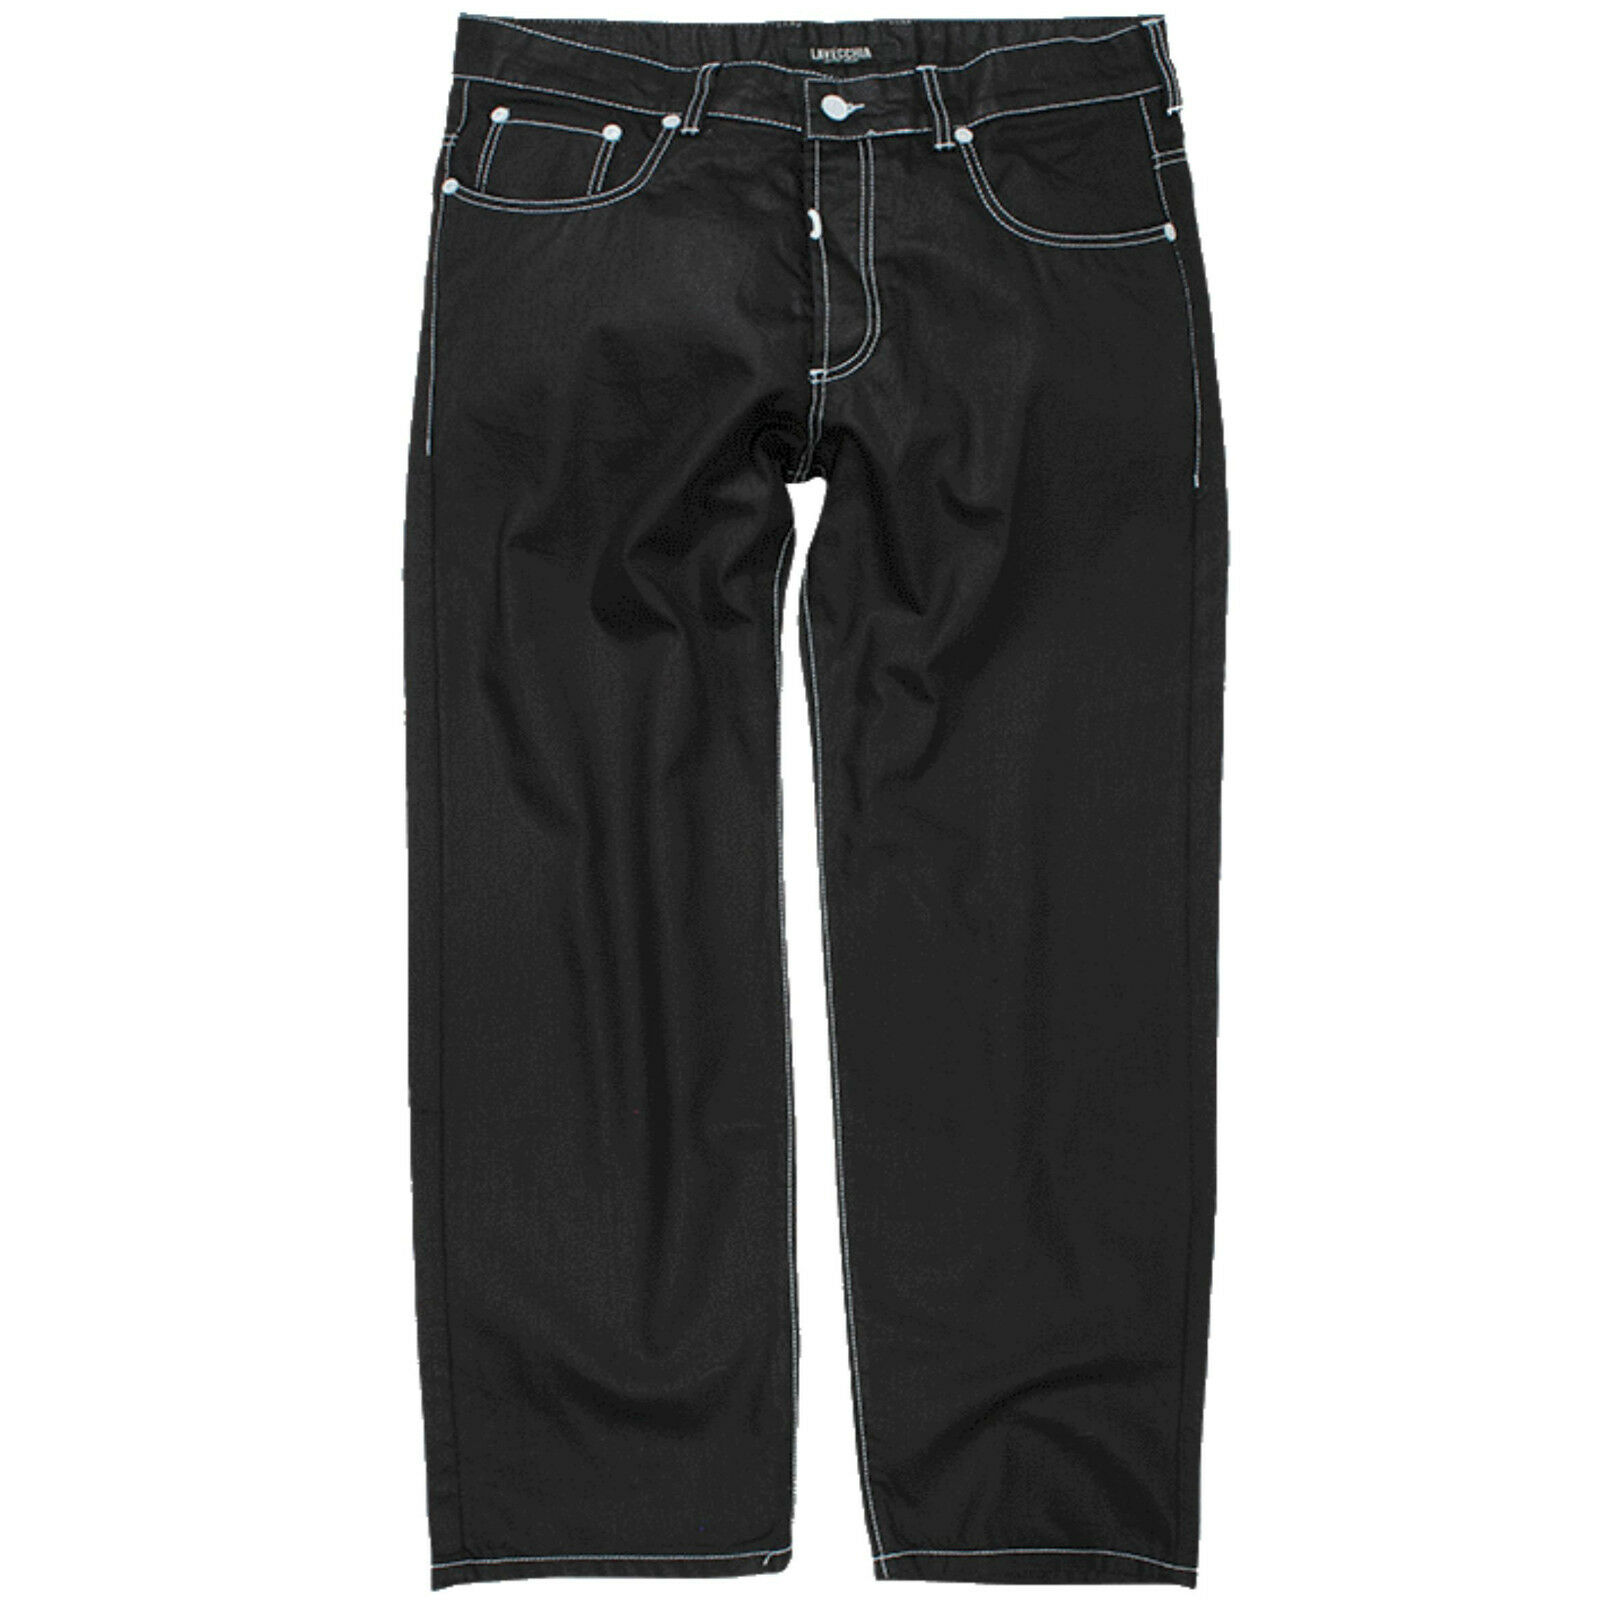 Lavecchia Herren Übergröße Designer Jeans Hose W38 40 42 44 46 48 50 52 (5752)